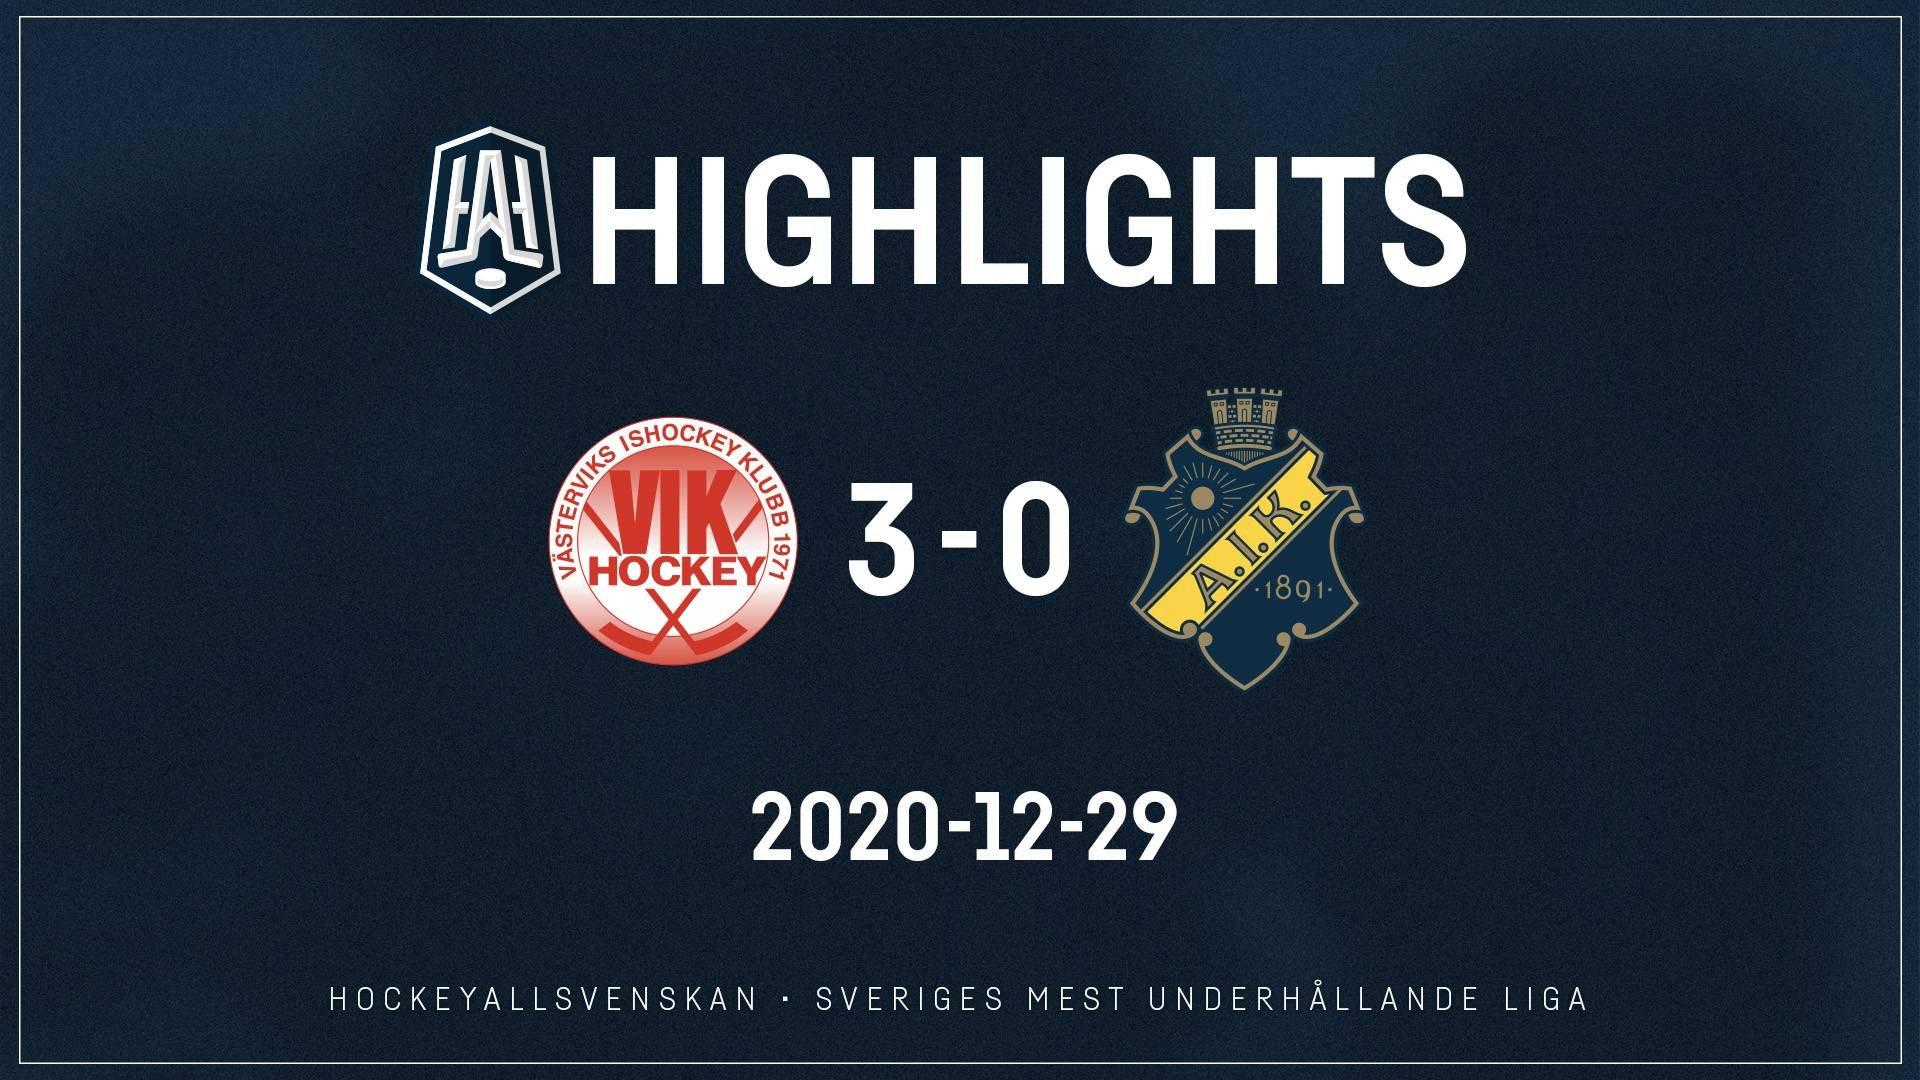 2020-12-29 Västervik - AIK 3-0